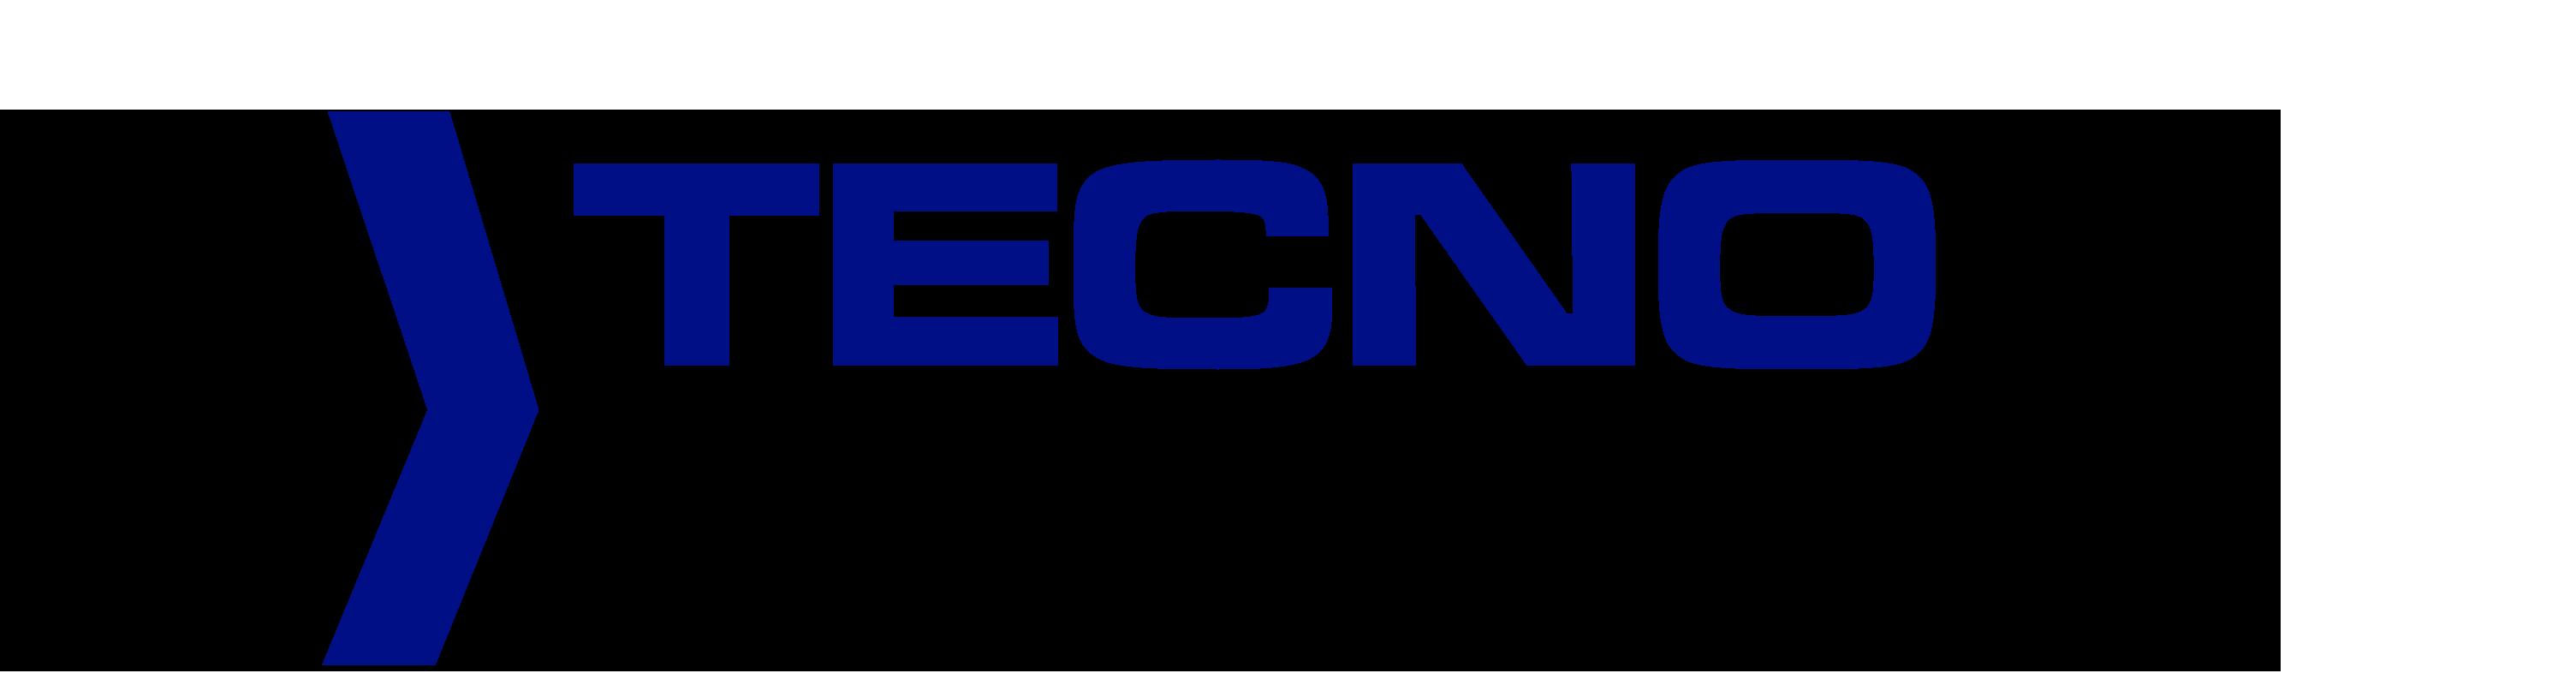 TecnoDynamic